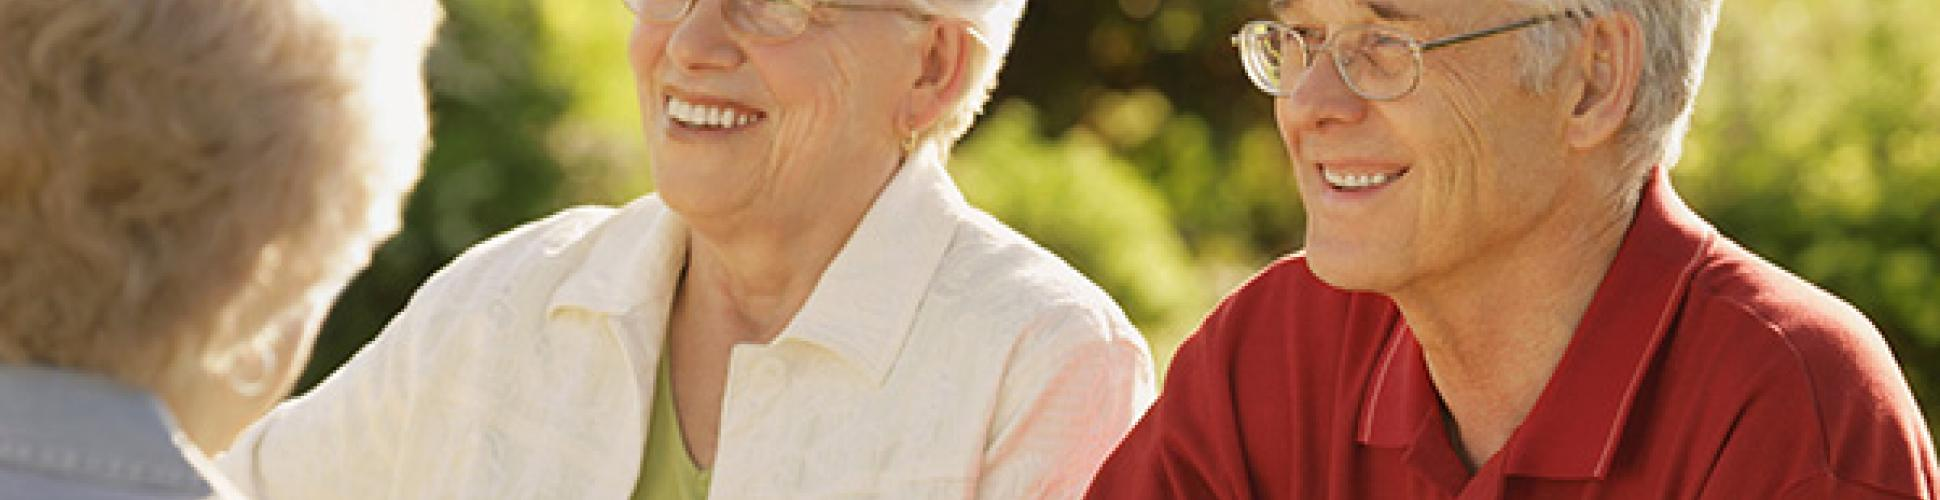 Image of older people enjoying life